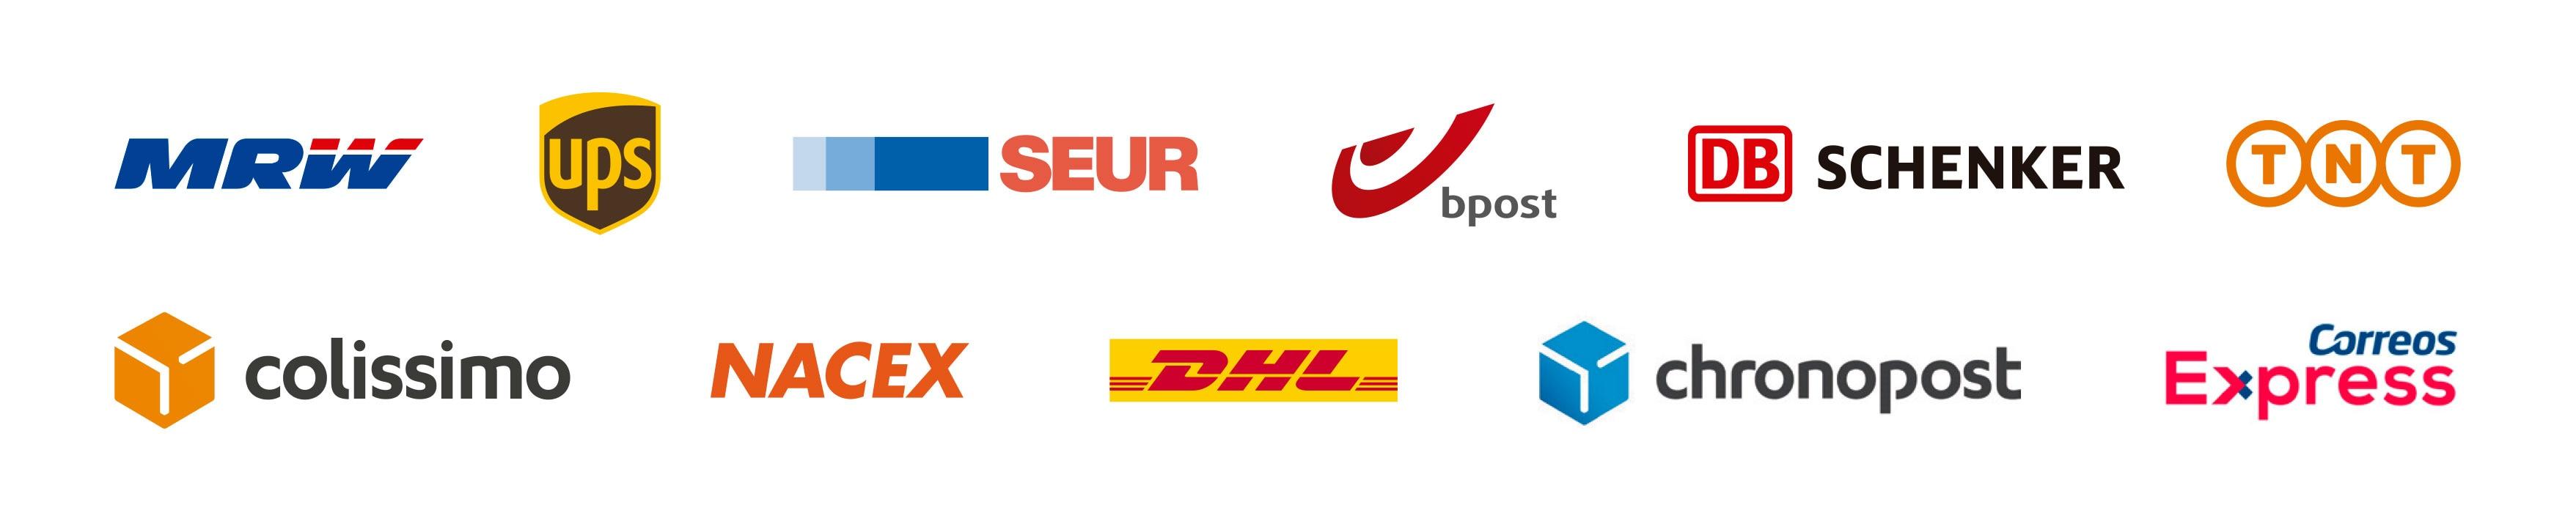 Integración con diferentes empresas de transporte